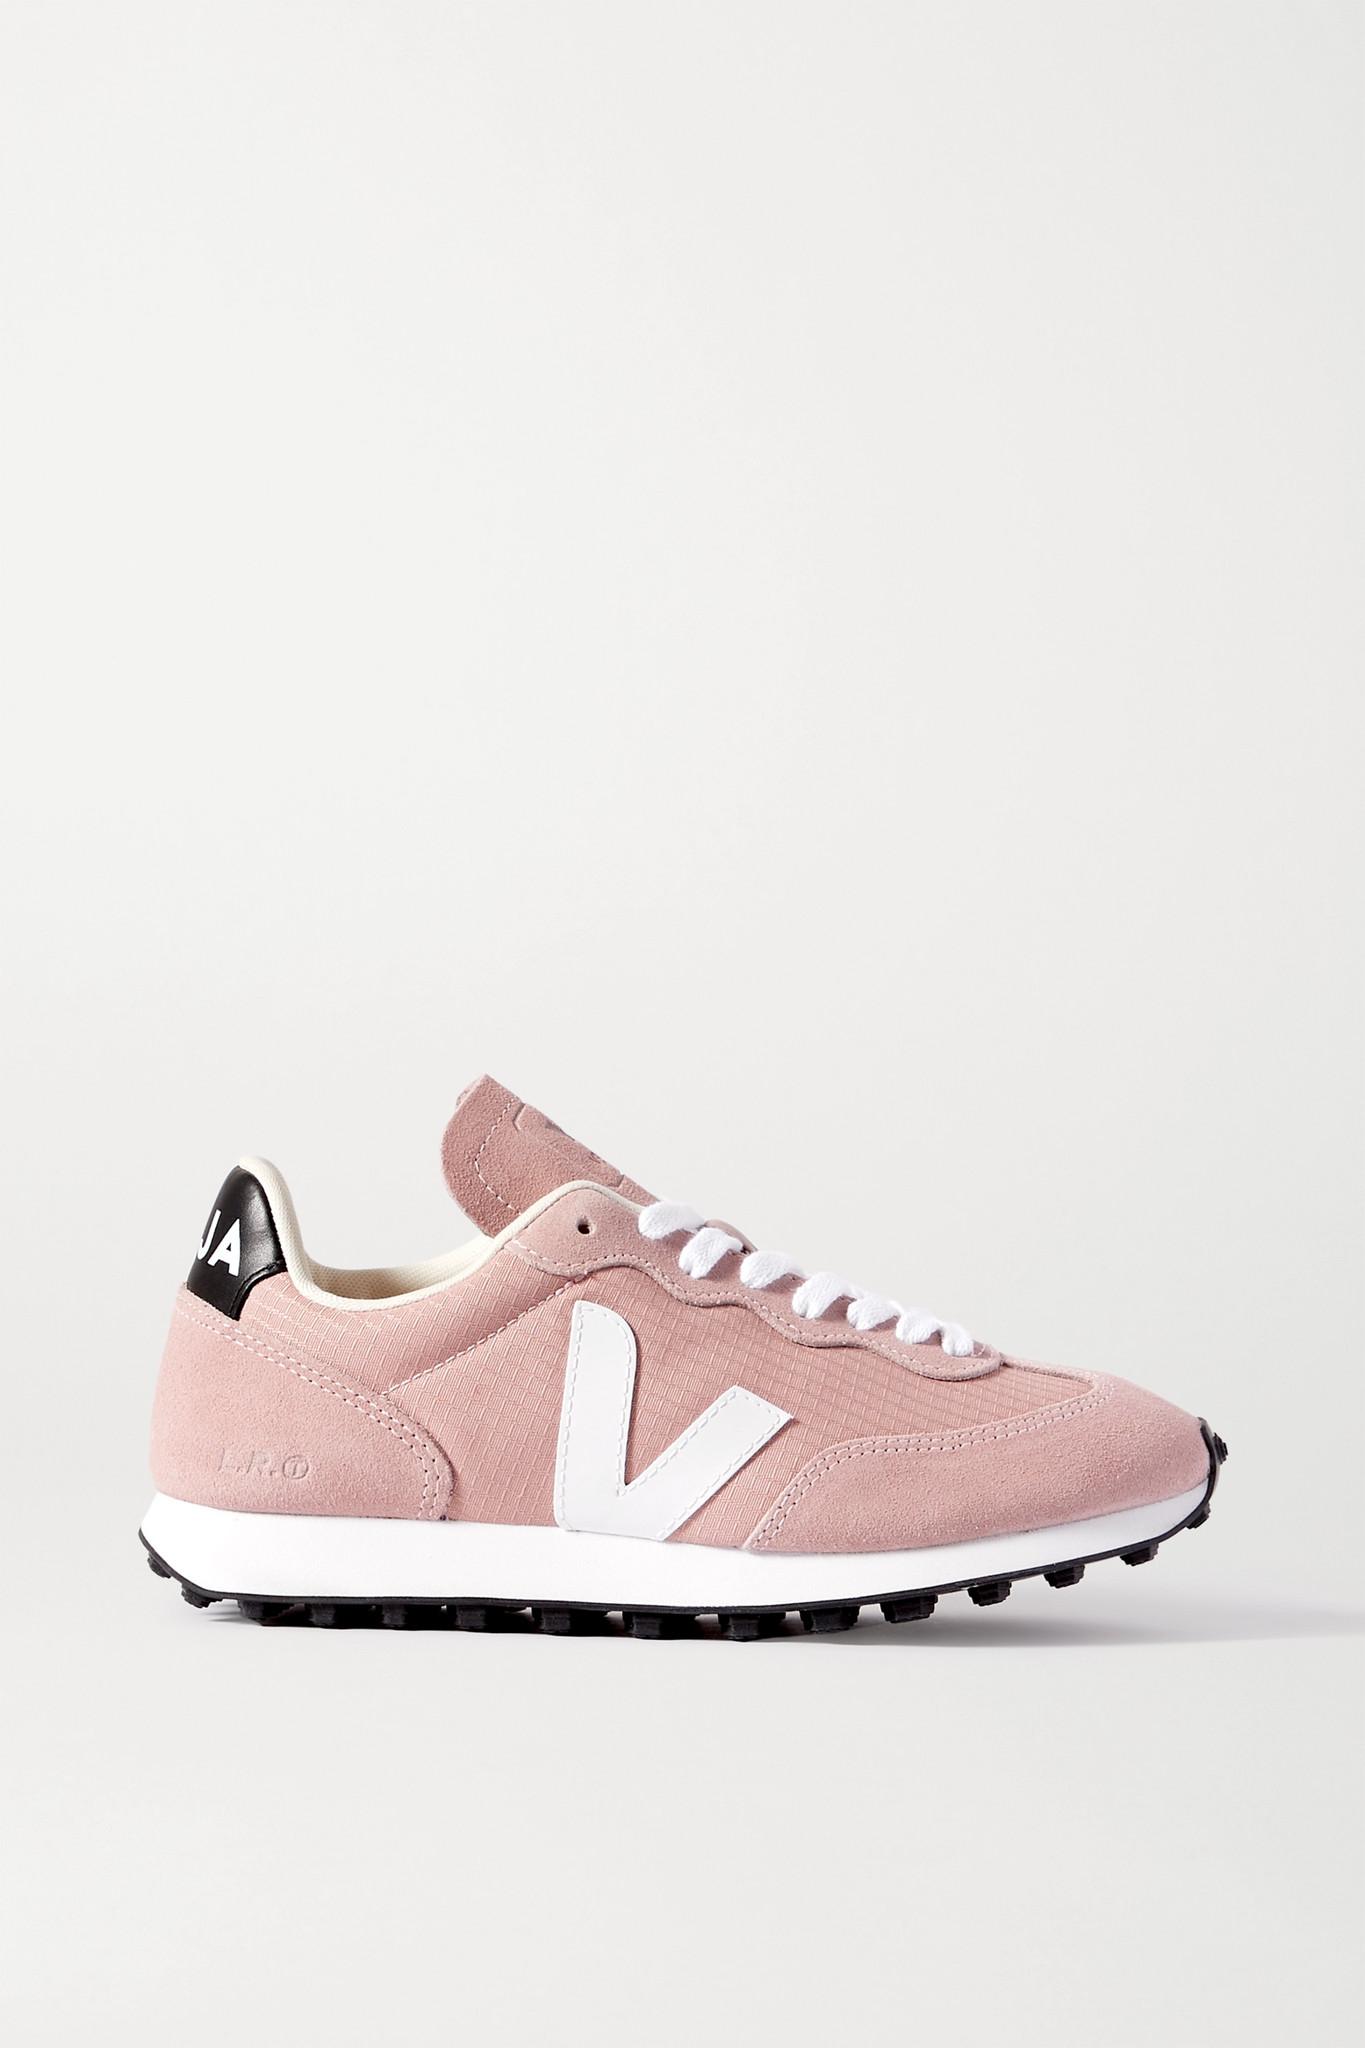 VEJA - 【net Sustain】rio Branco 皮革边饰绒面革网眼运动鞋 - 粉红色 - IT41